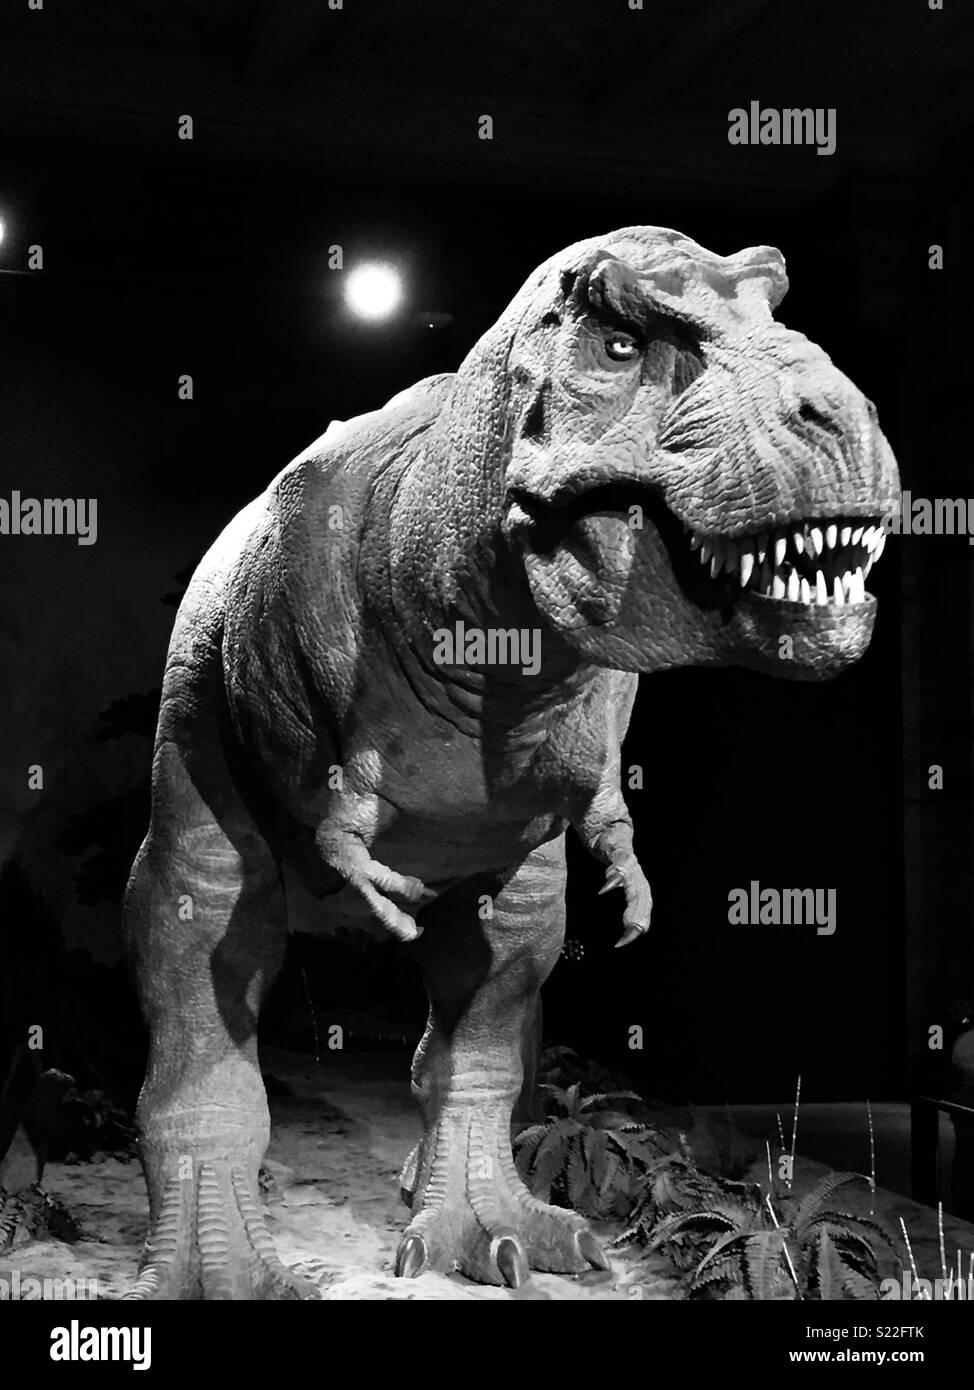 Scary T-Rex Dinosaur - Stock Image